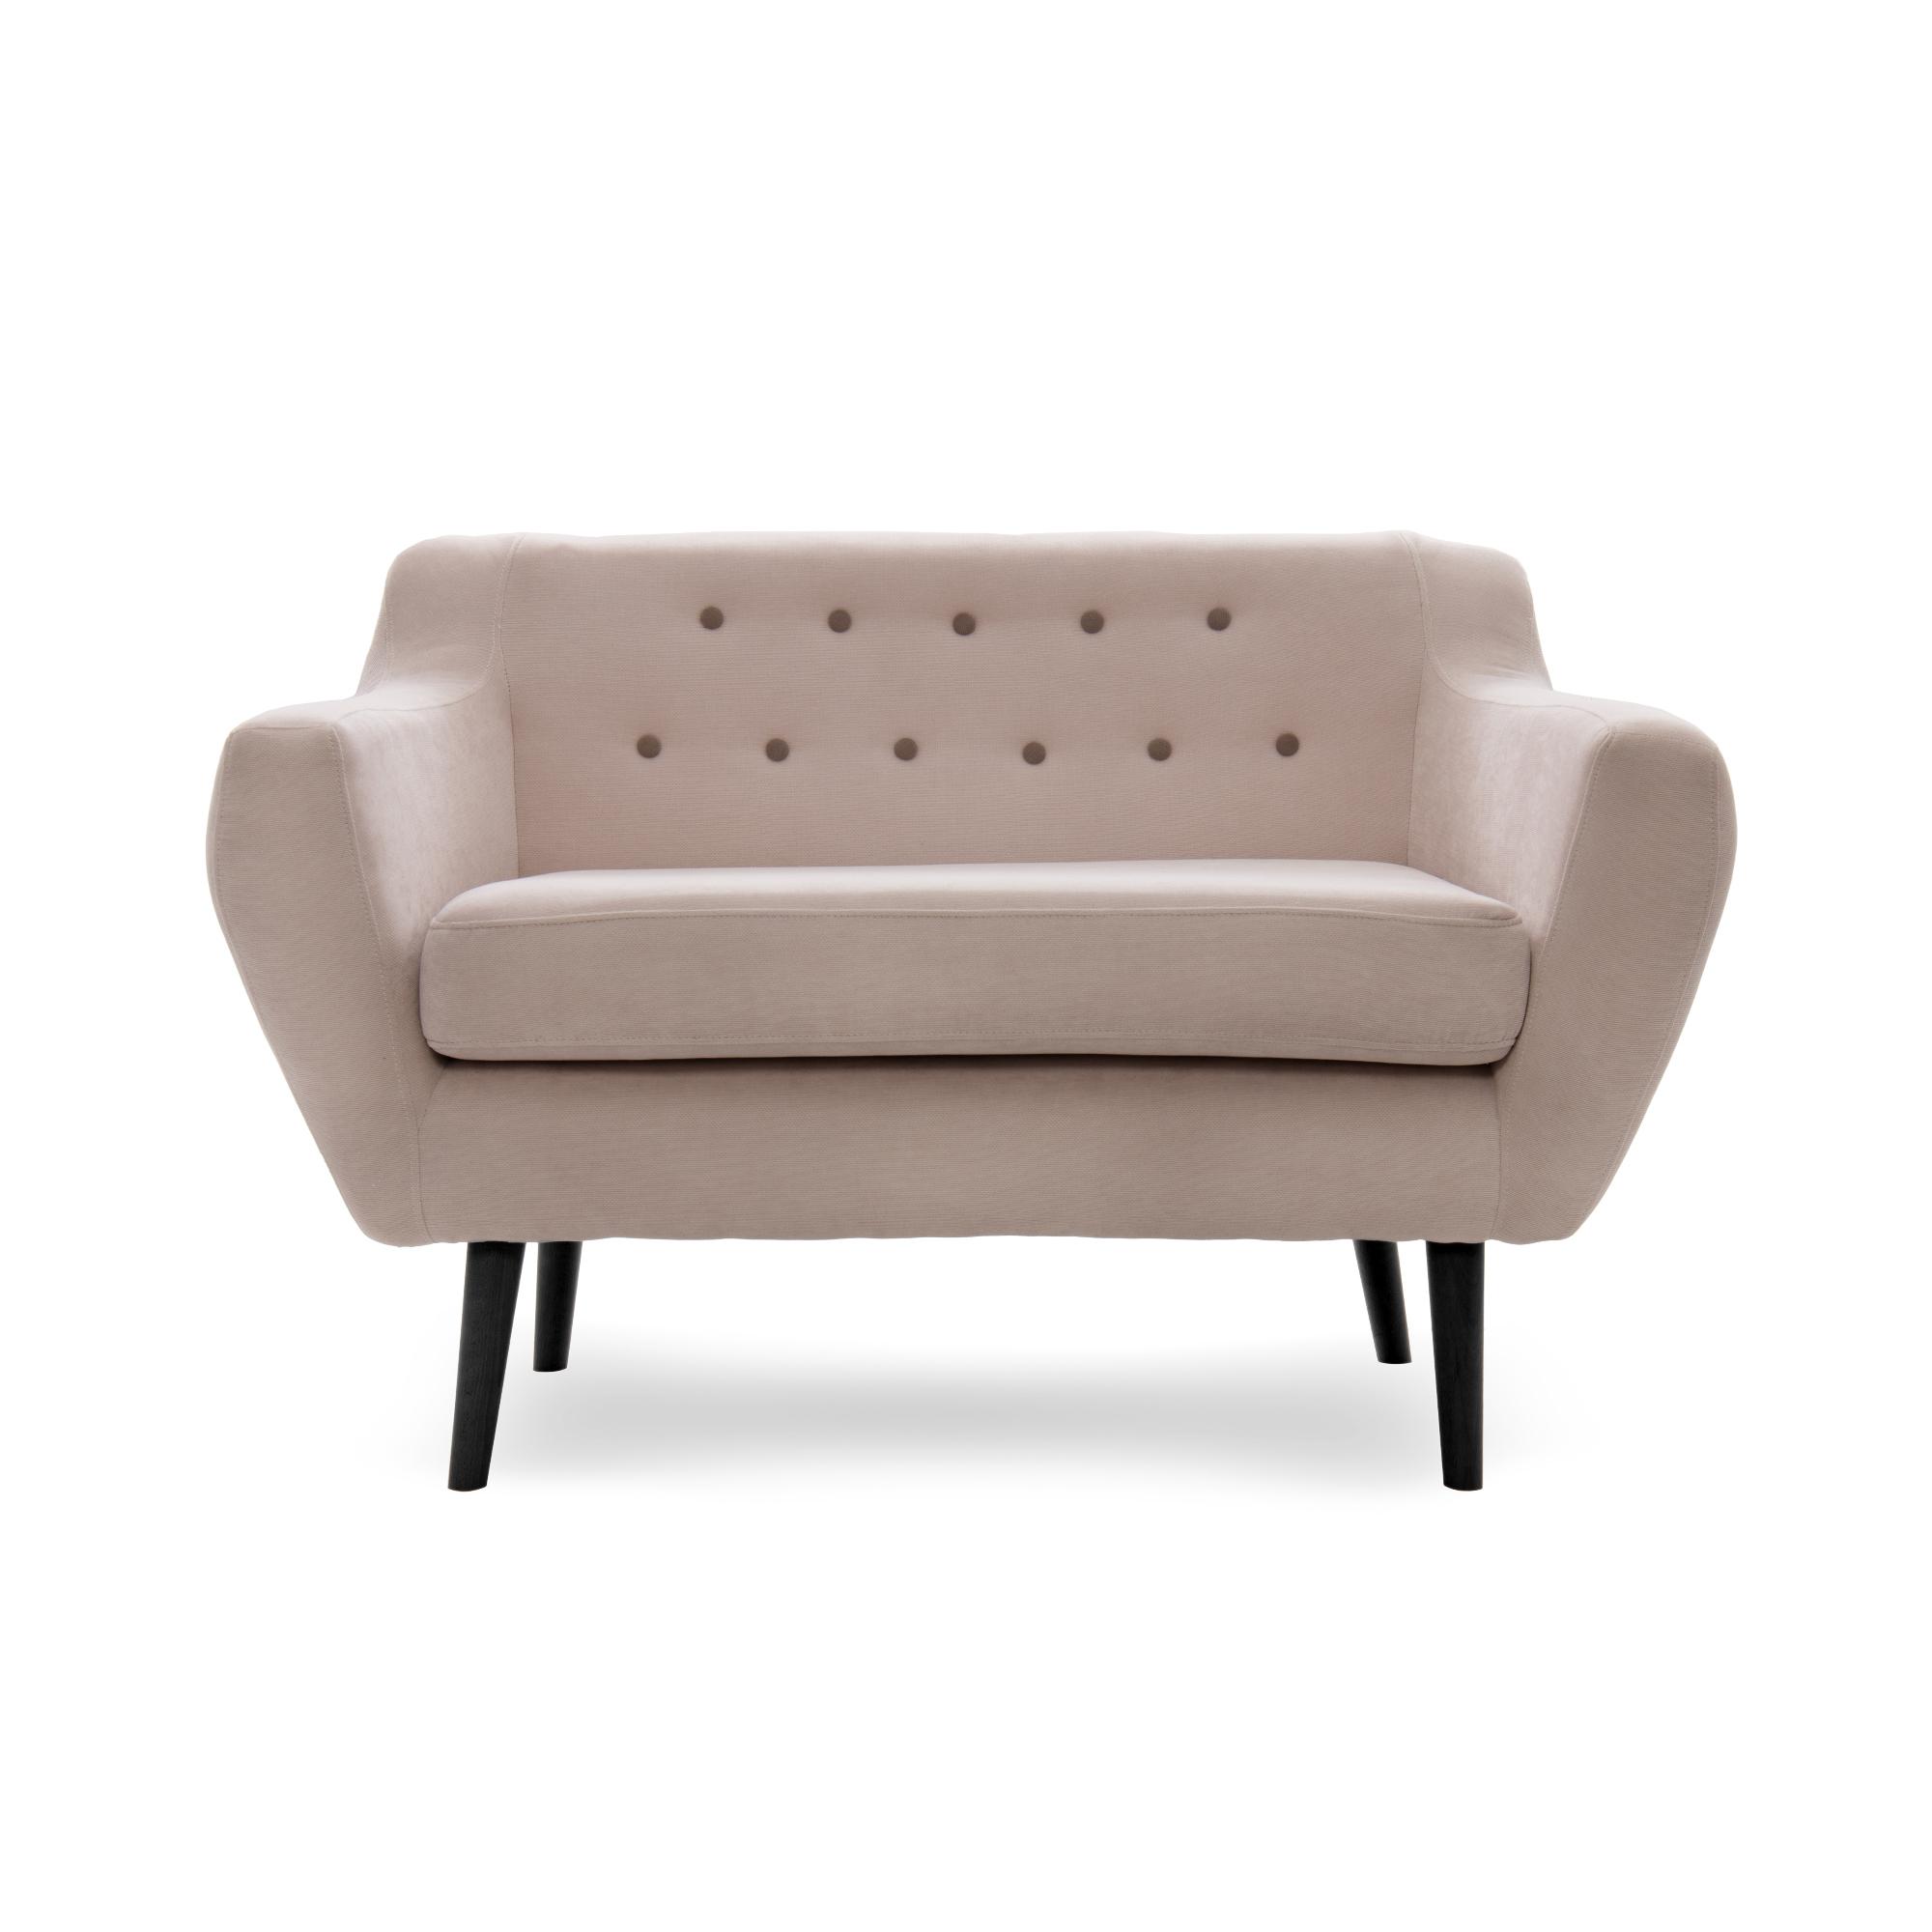 Canapea Fixa 2 locuri Kelly Beige/Black